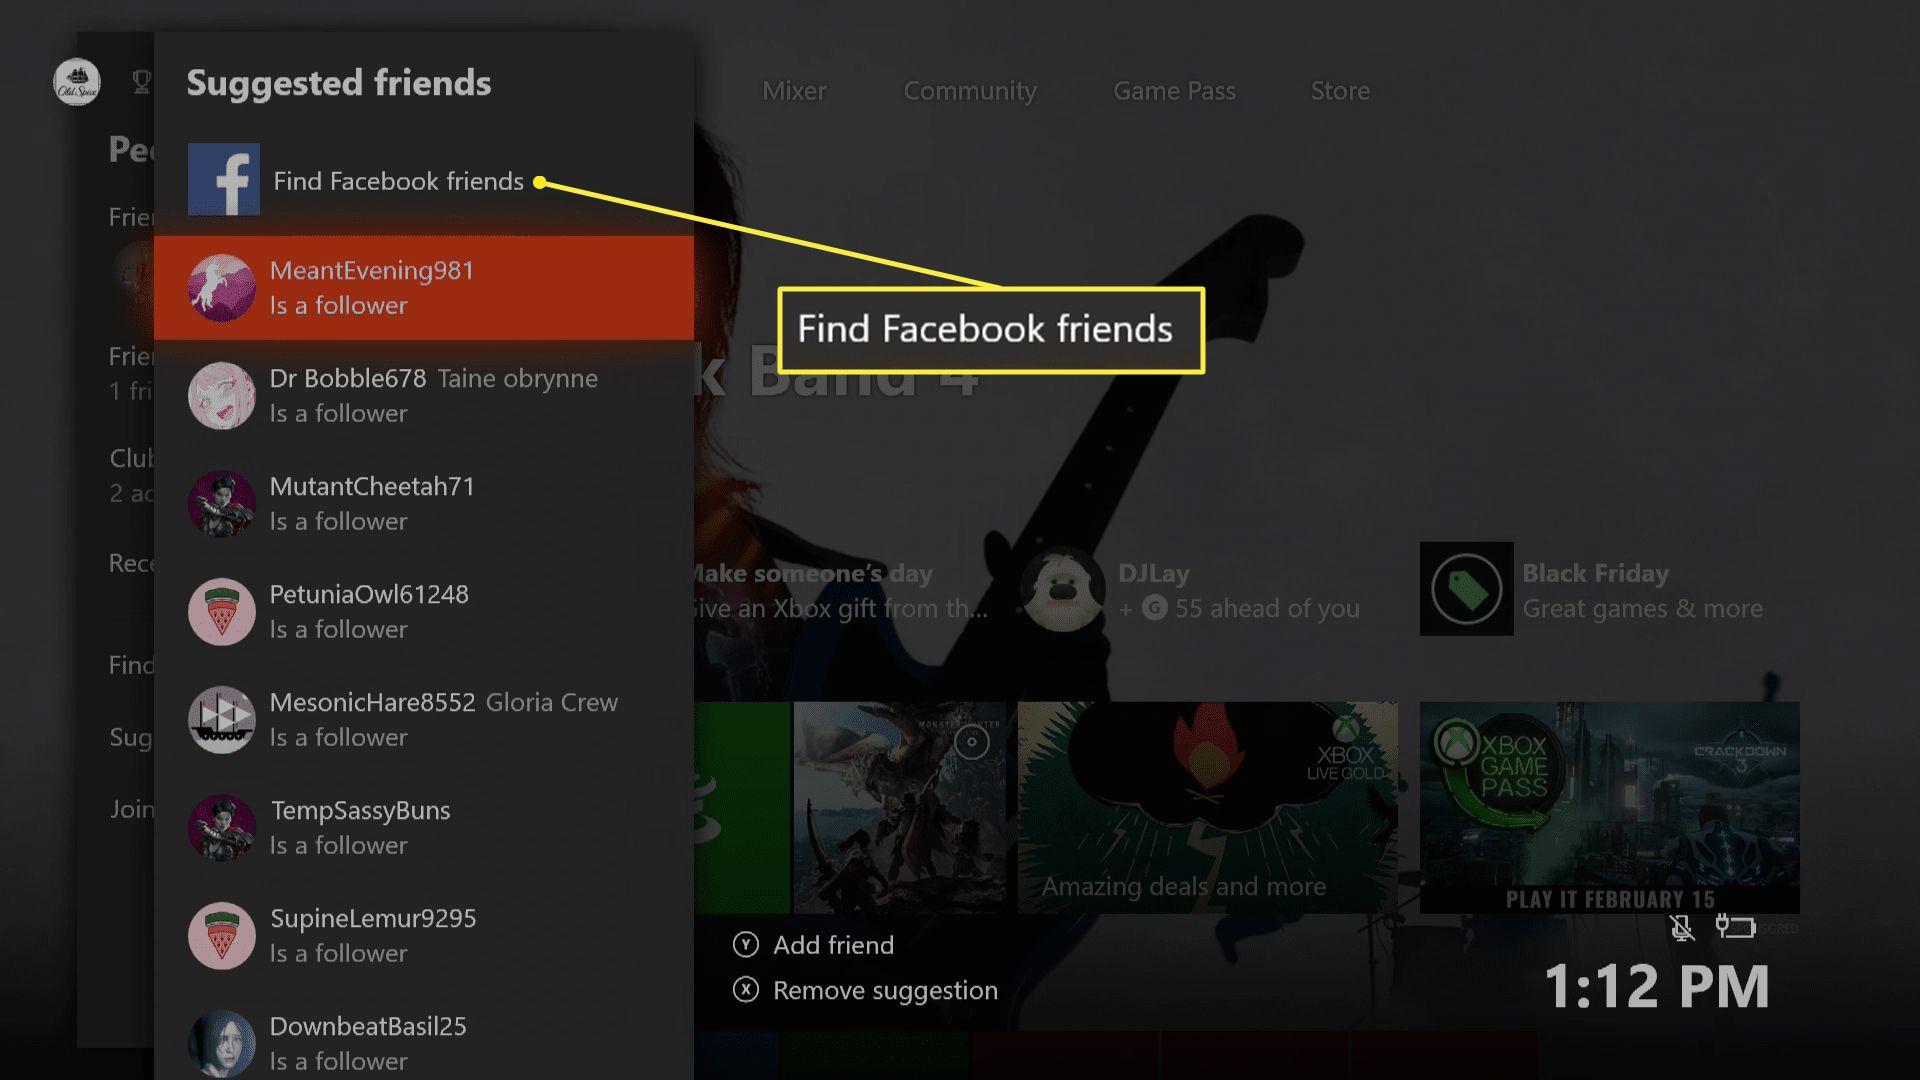 Xbox One suggested friends menu